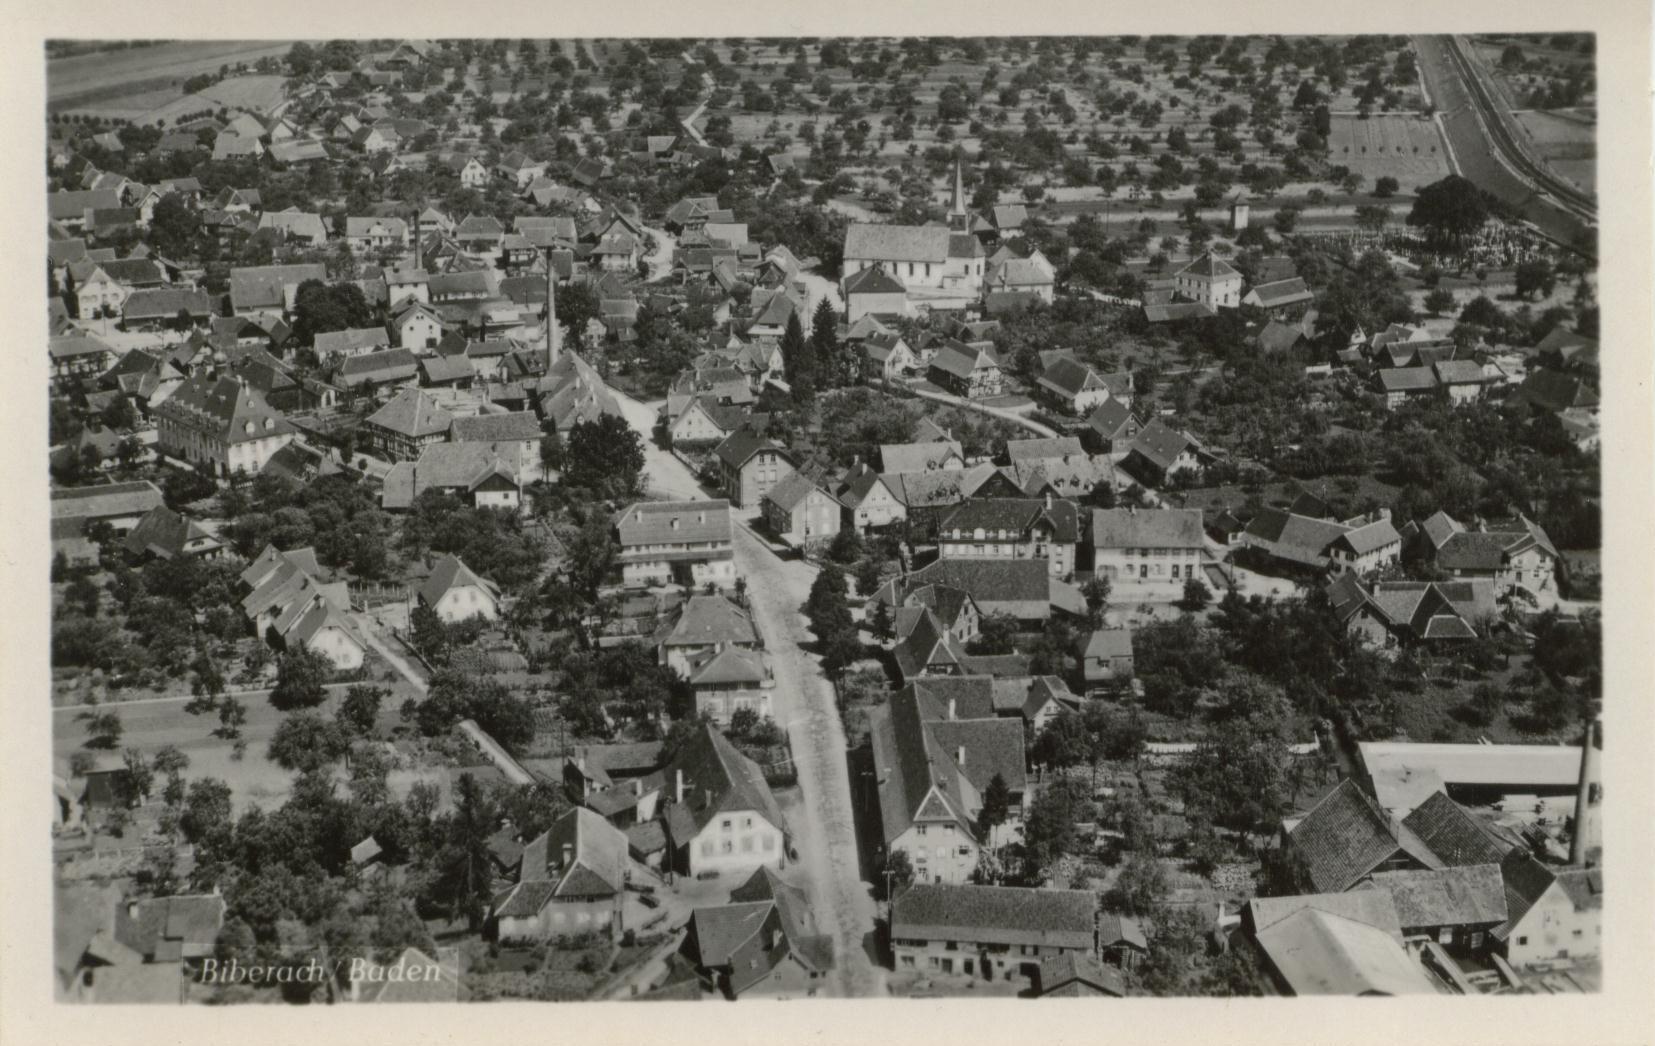 Postkarte Biberach vor 1930